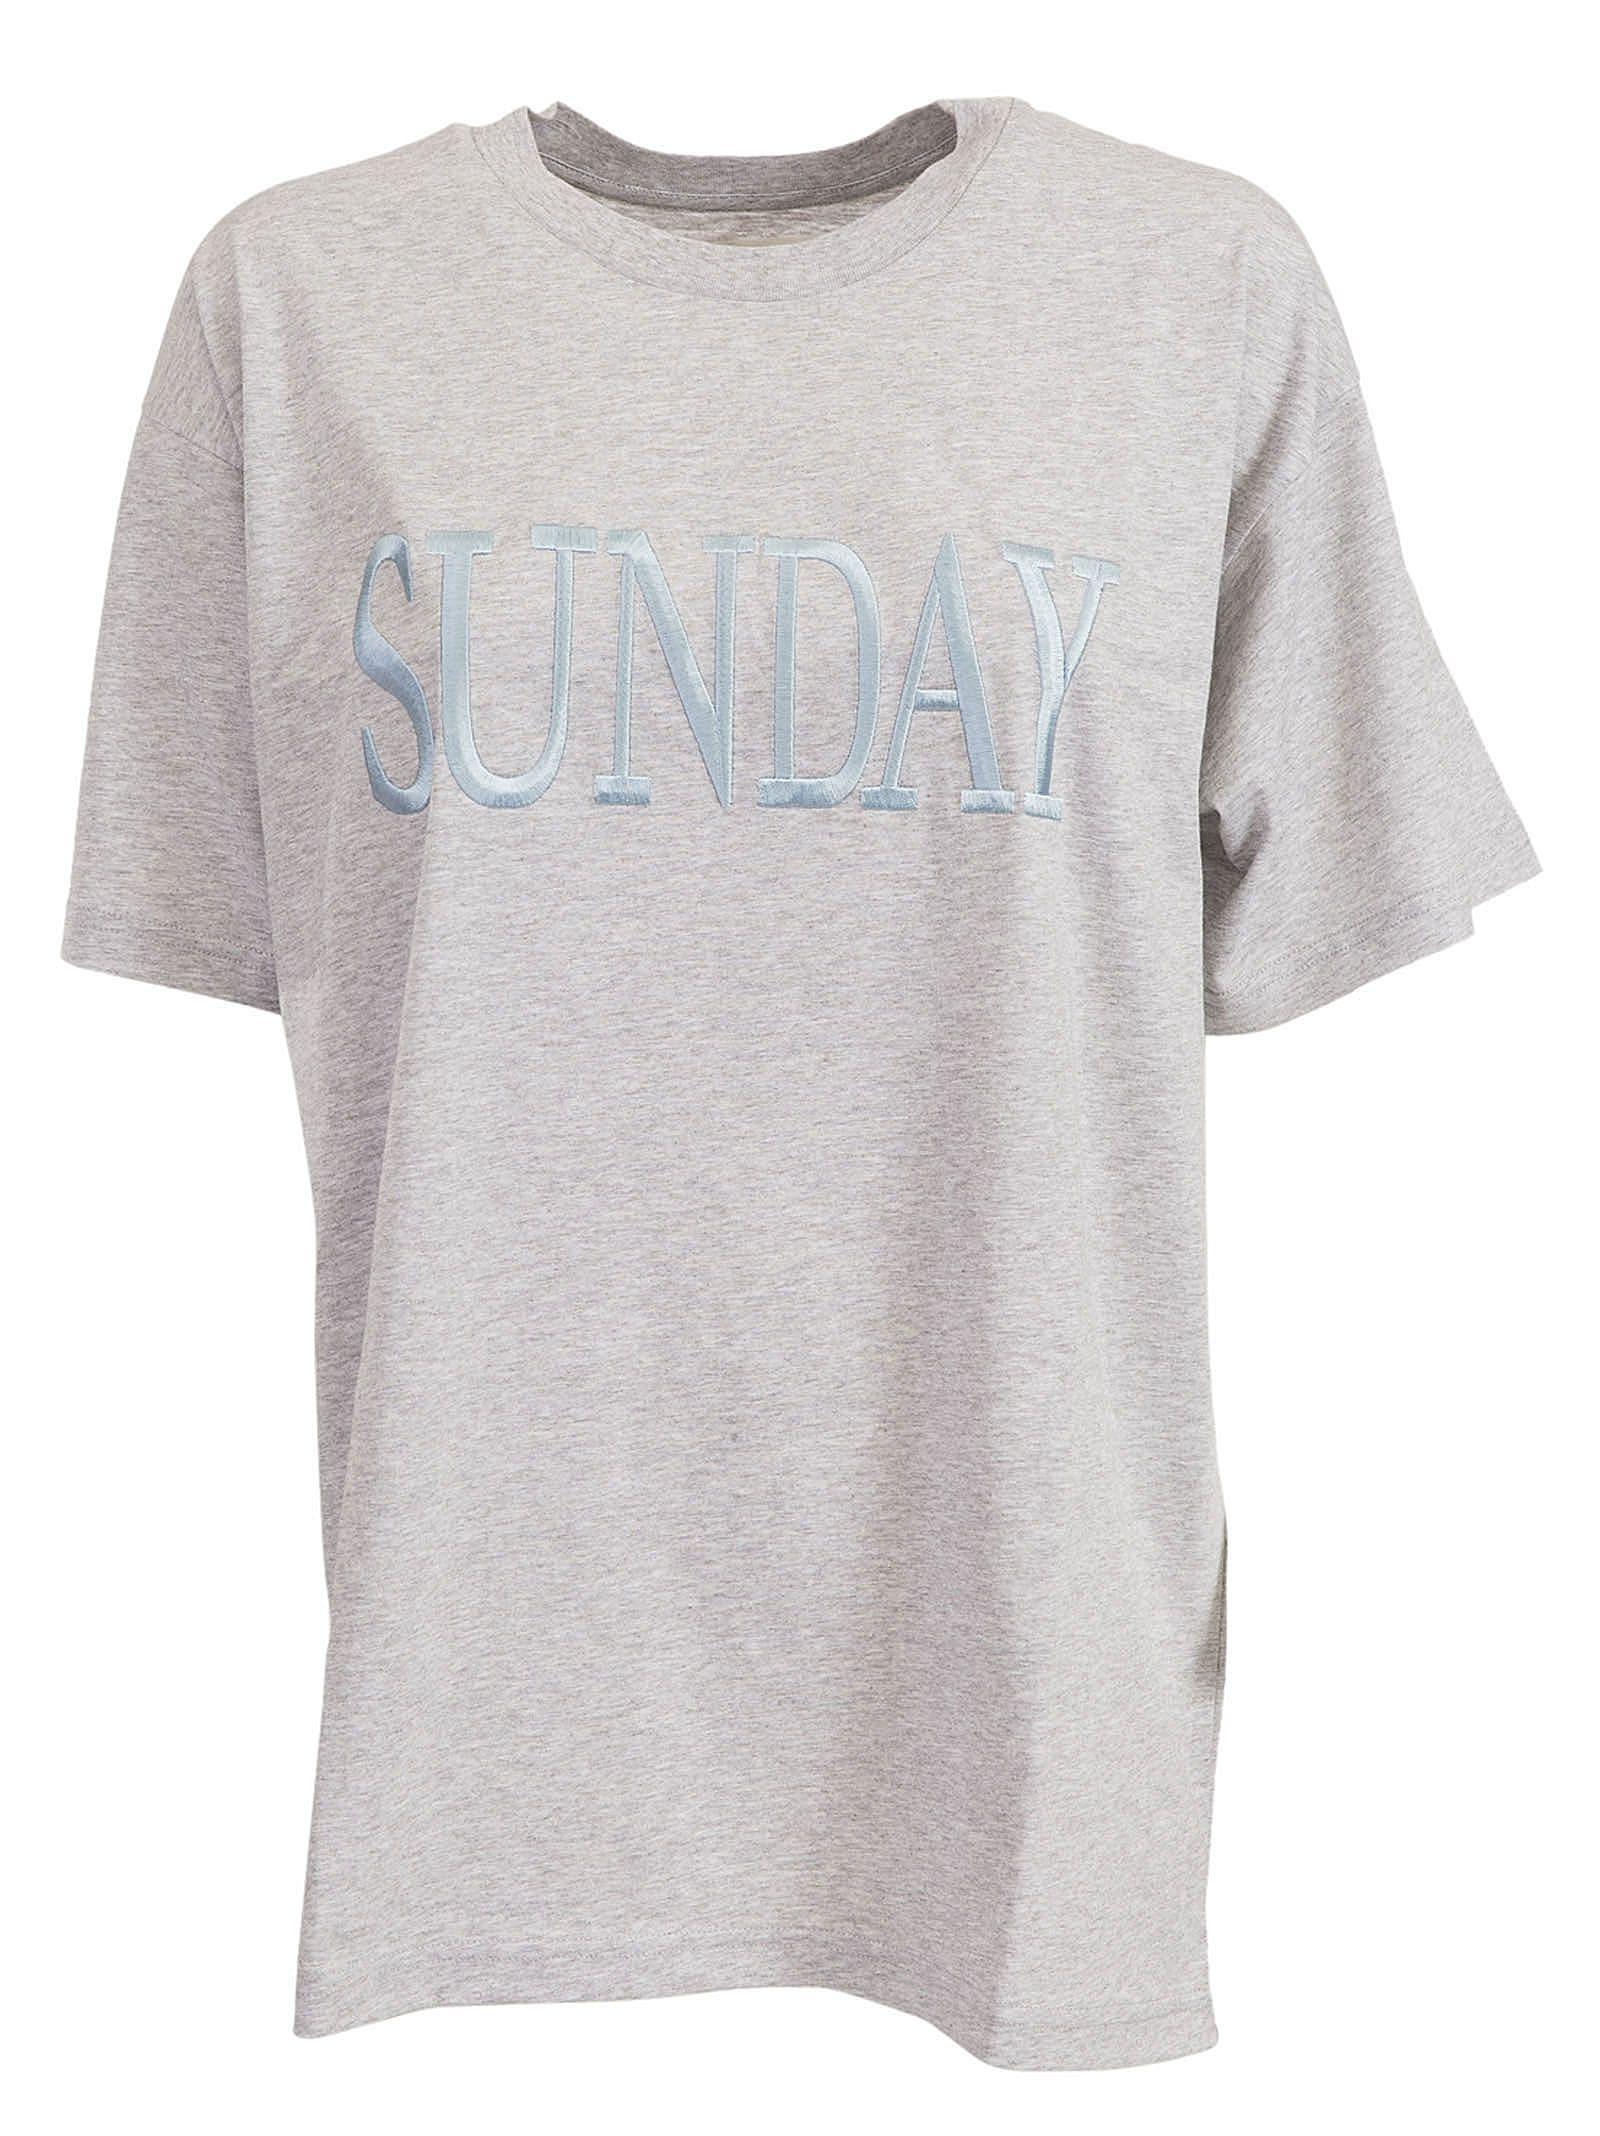 Alberta Ferretti Sunday Embroidered T-shirt